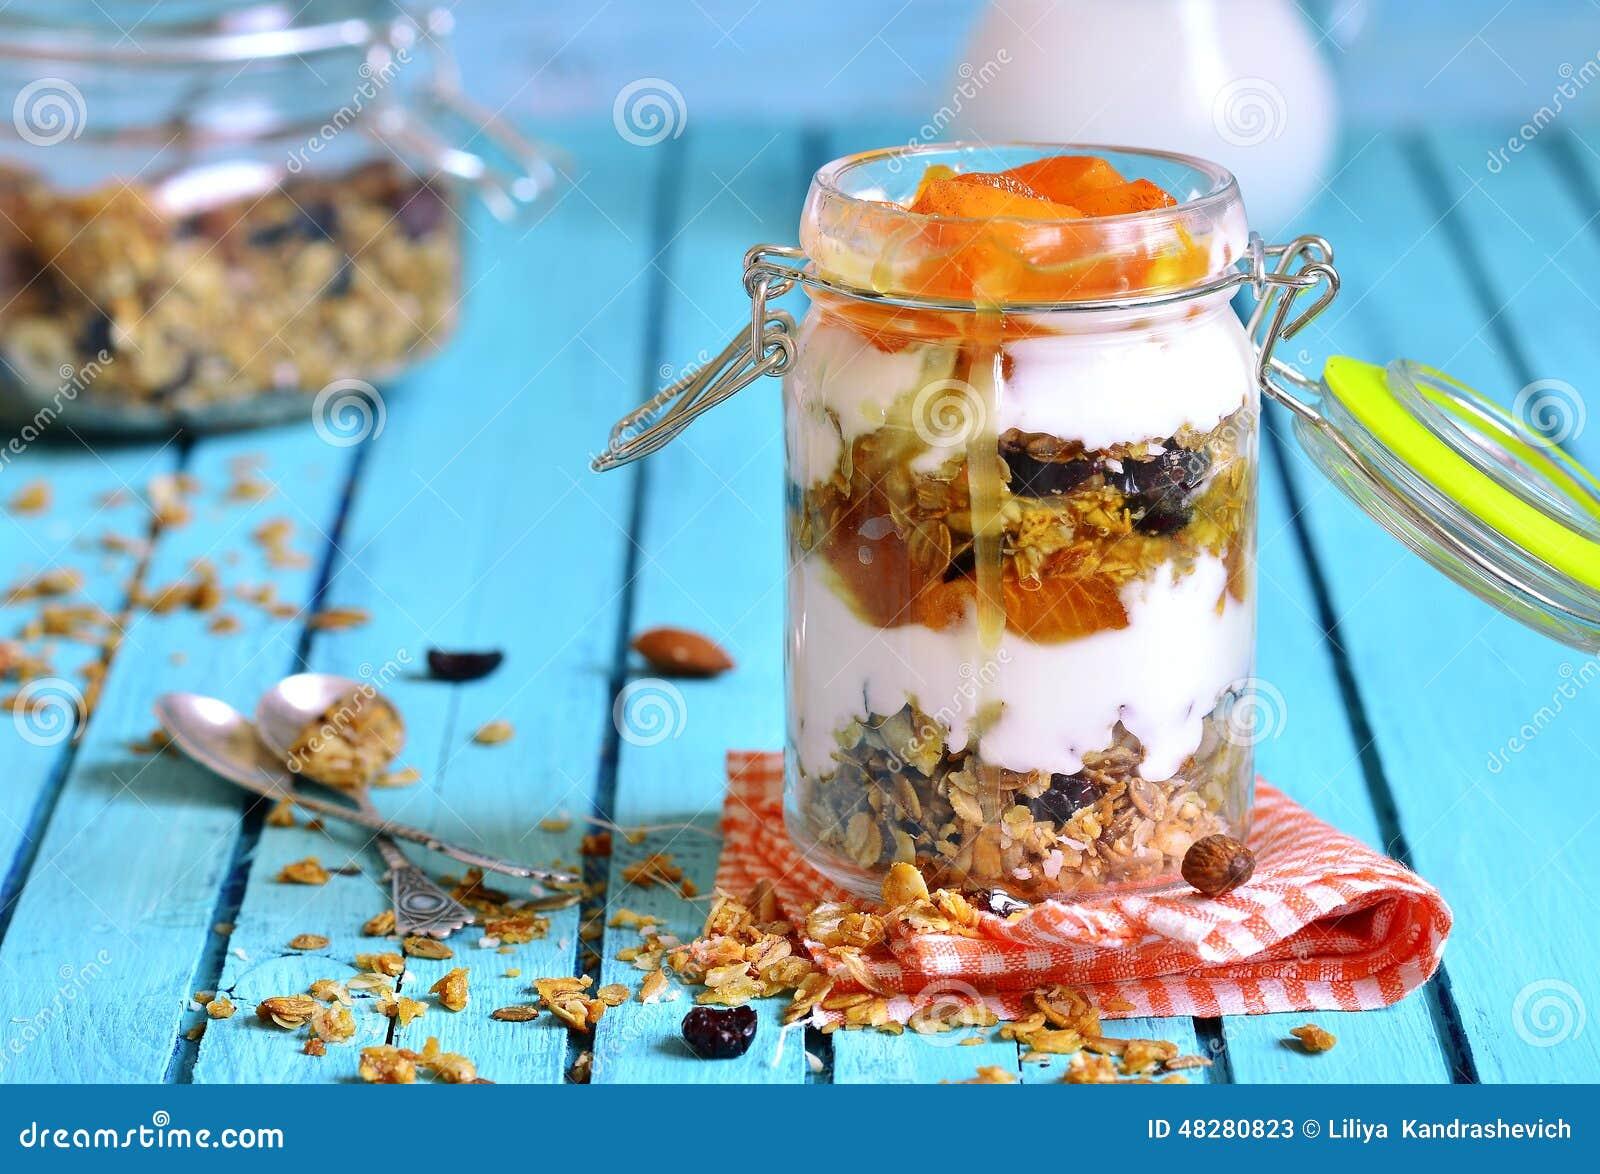 Gelaagd dessert van granola, yoghurt, dadelpruim en honing